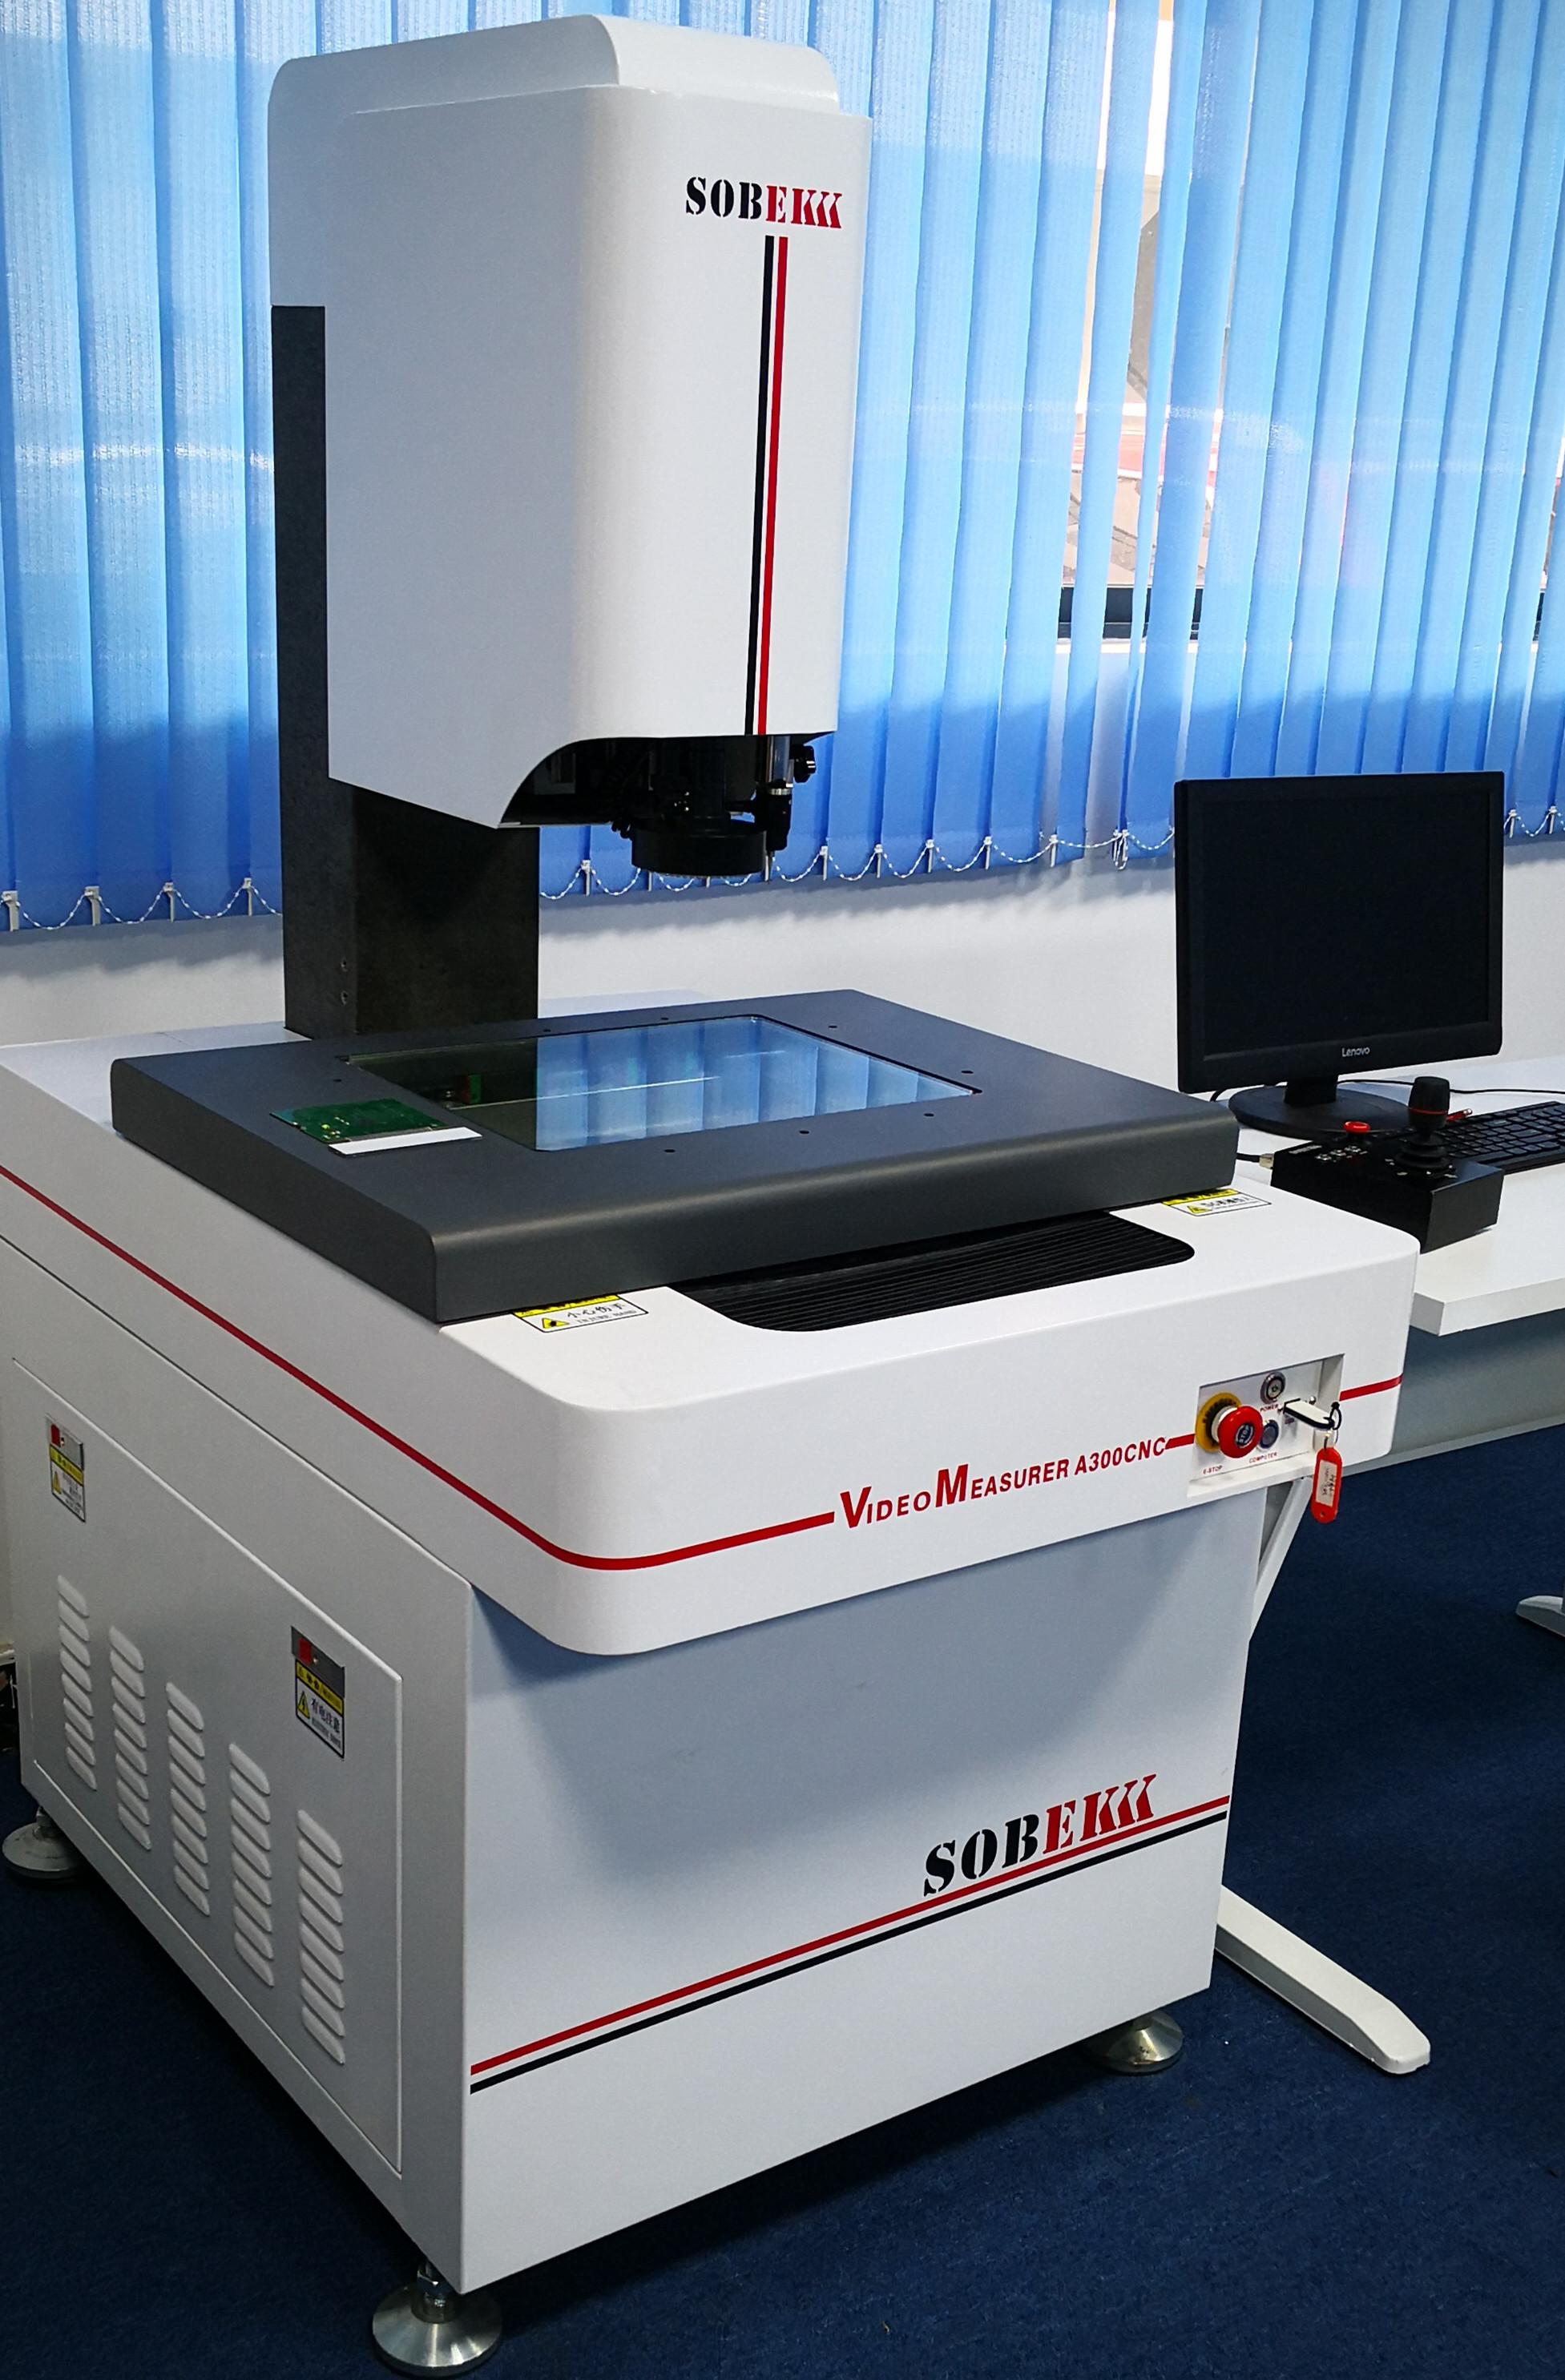 SOBEKK A-CNC Automatic Video Measuring  Machine